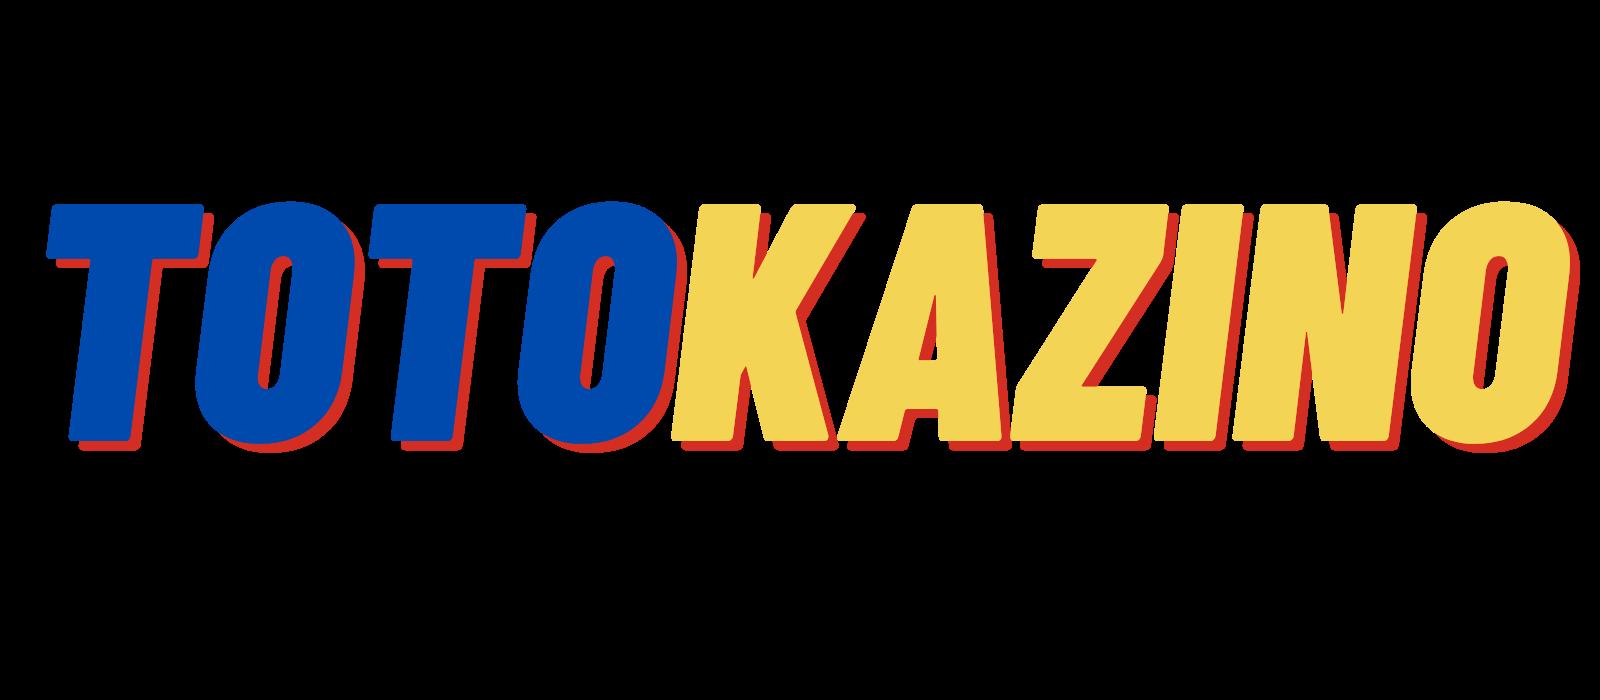 totokazino.com – Online kazino Latvijā